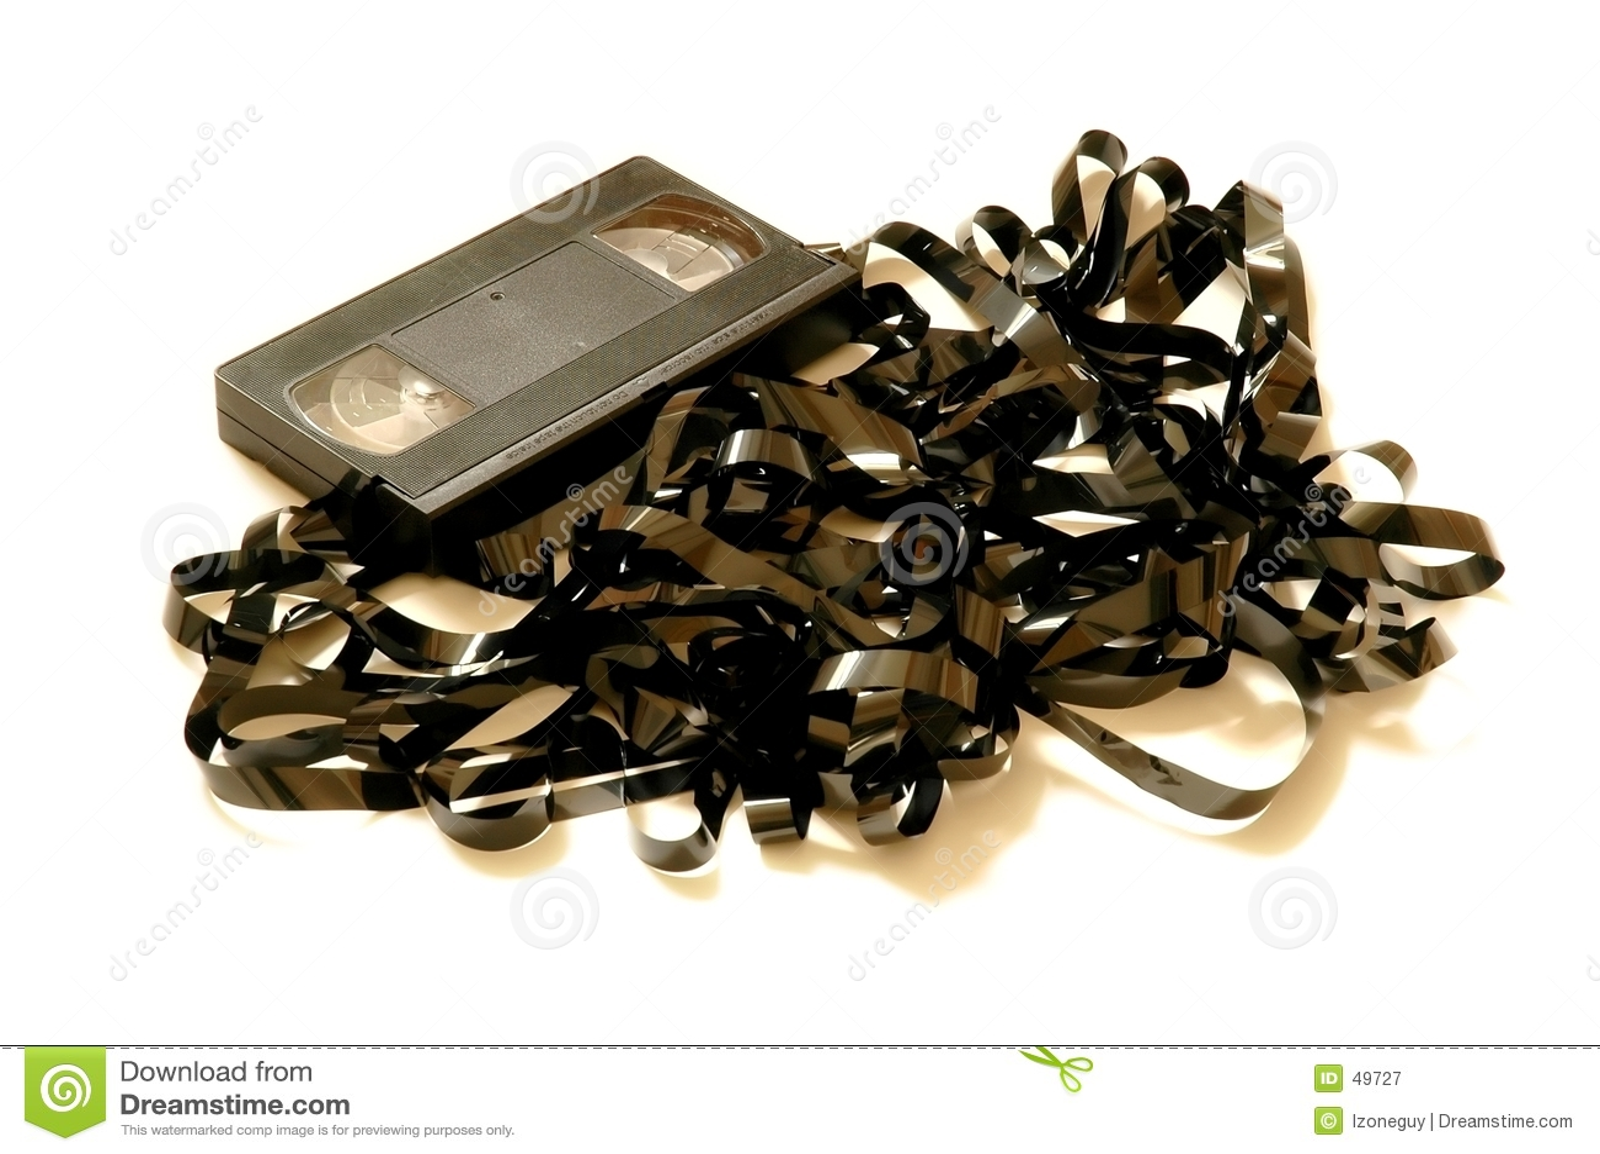 VHS Tape unwound - full